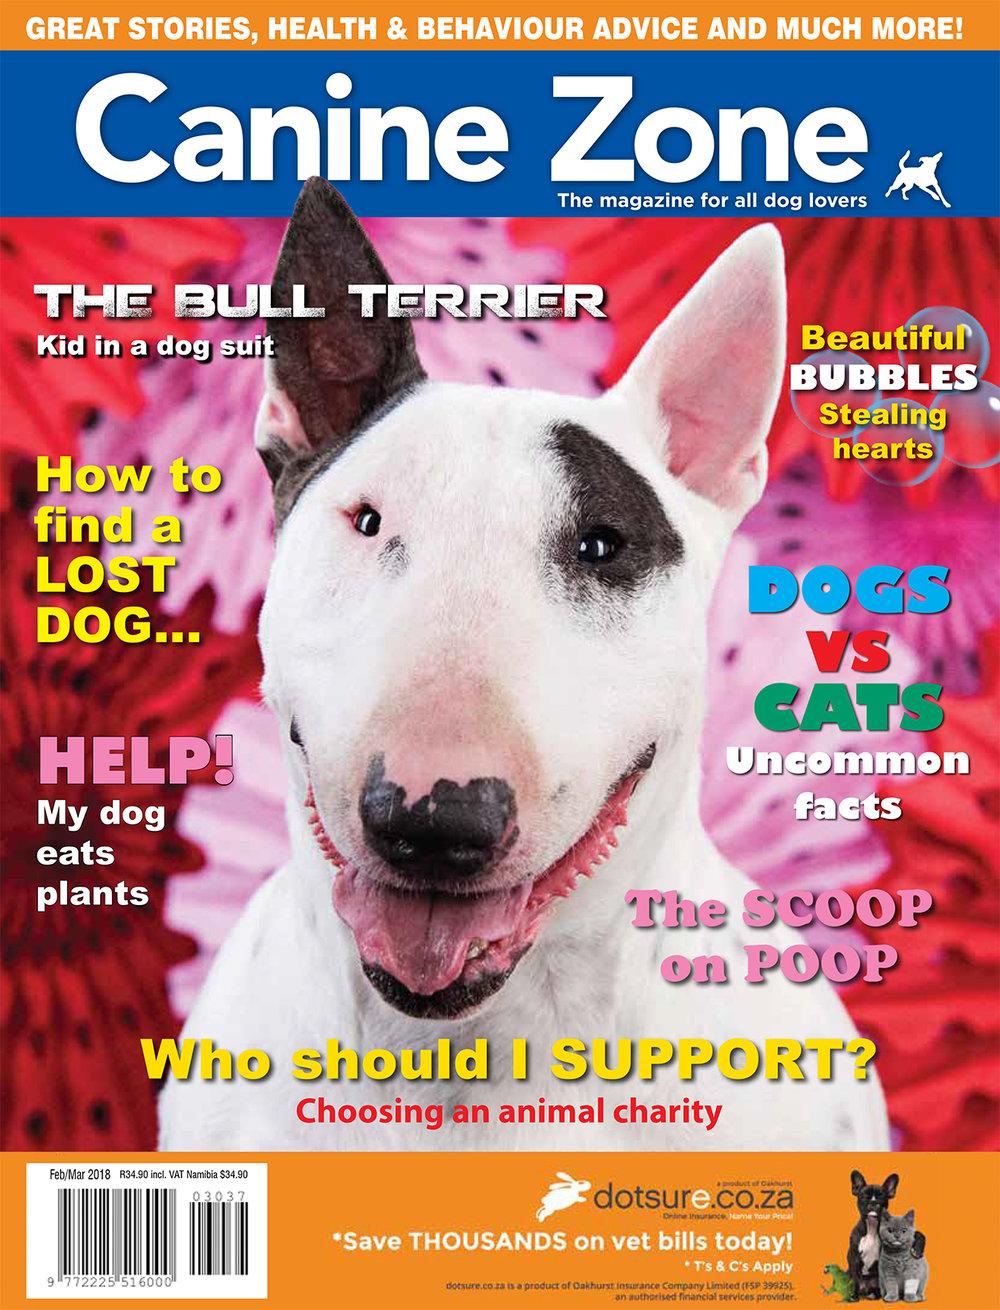 CANINE ZONE FEBRUARY 2018 lowres full copy 1-56-1.jpg